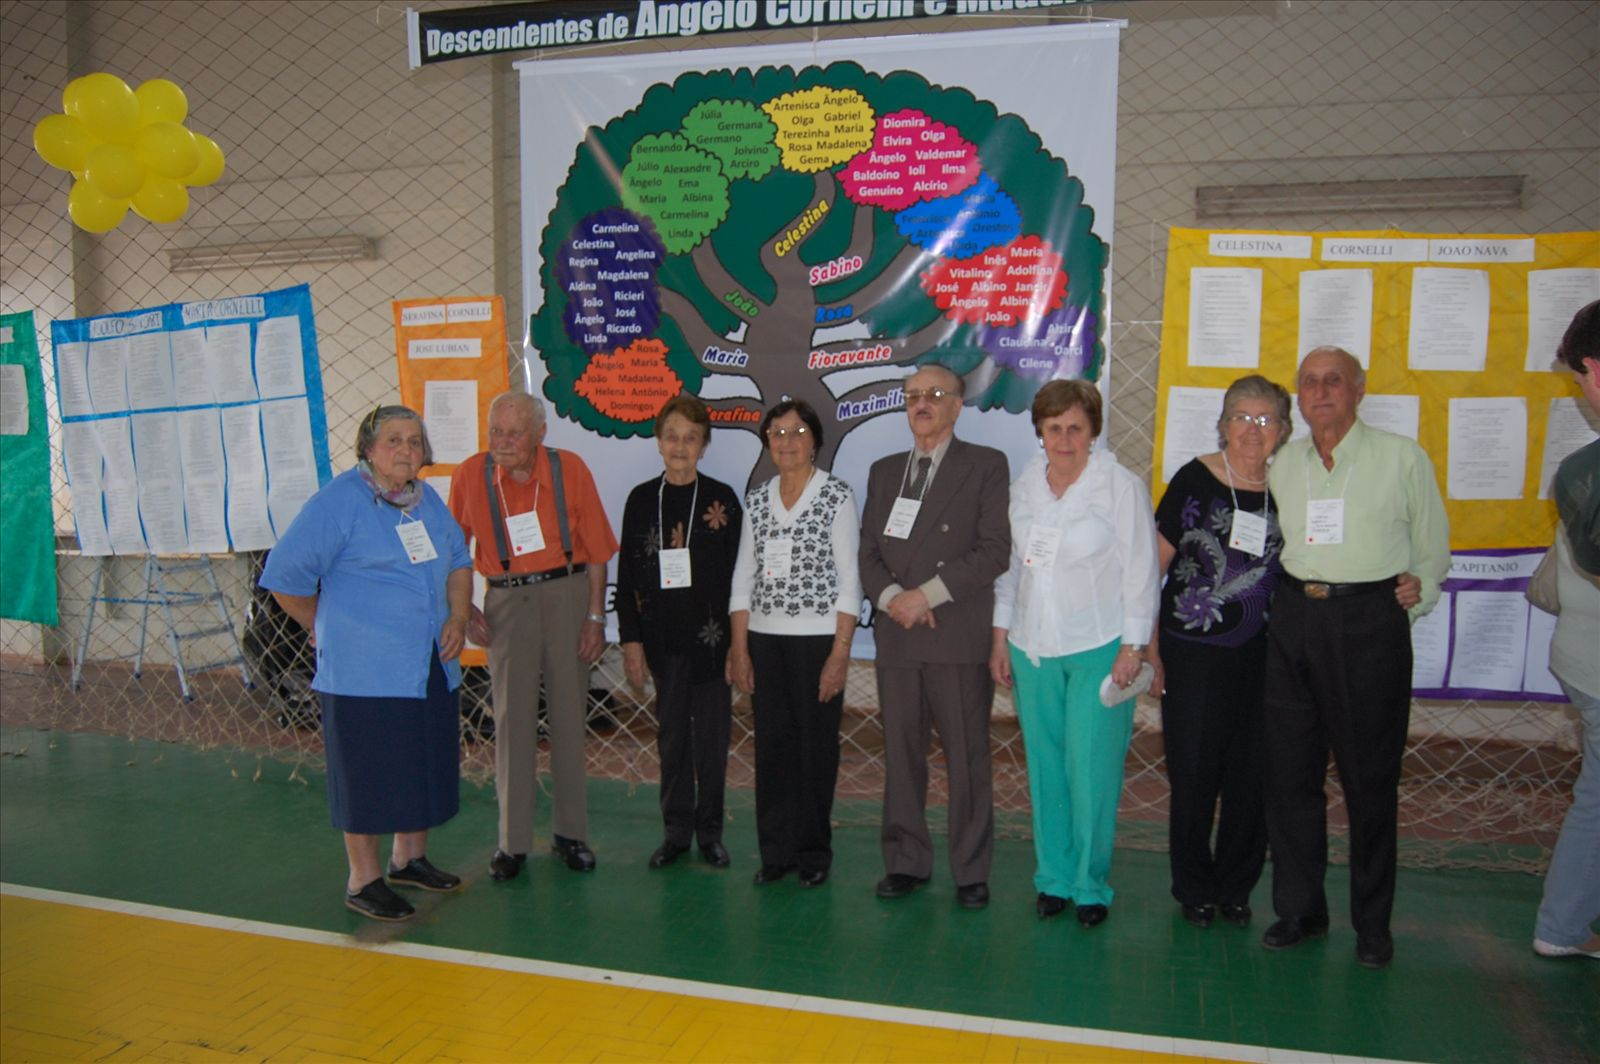 2º Encontro Família Cornelli - 11.10.2009 (201)_0